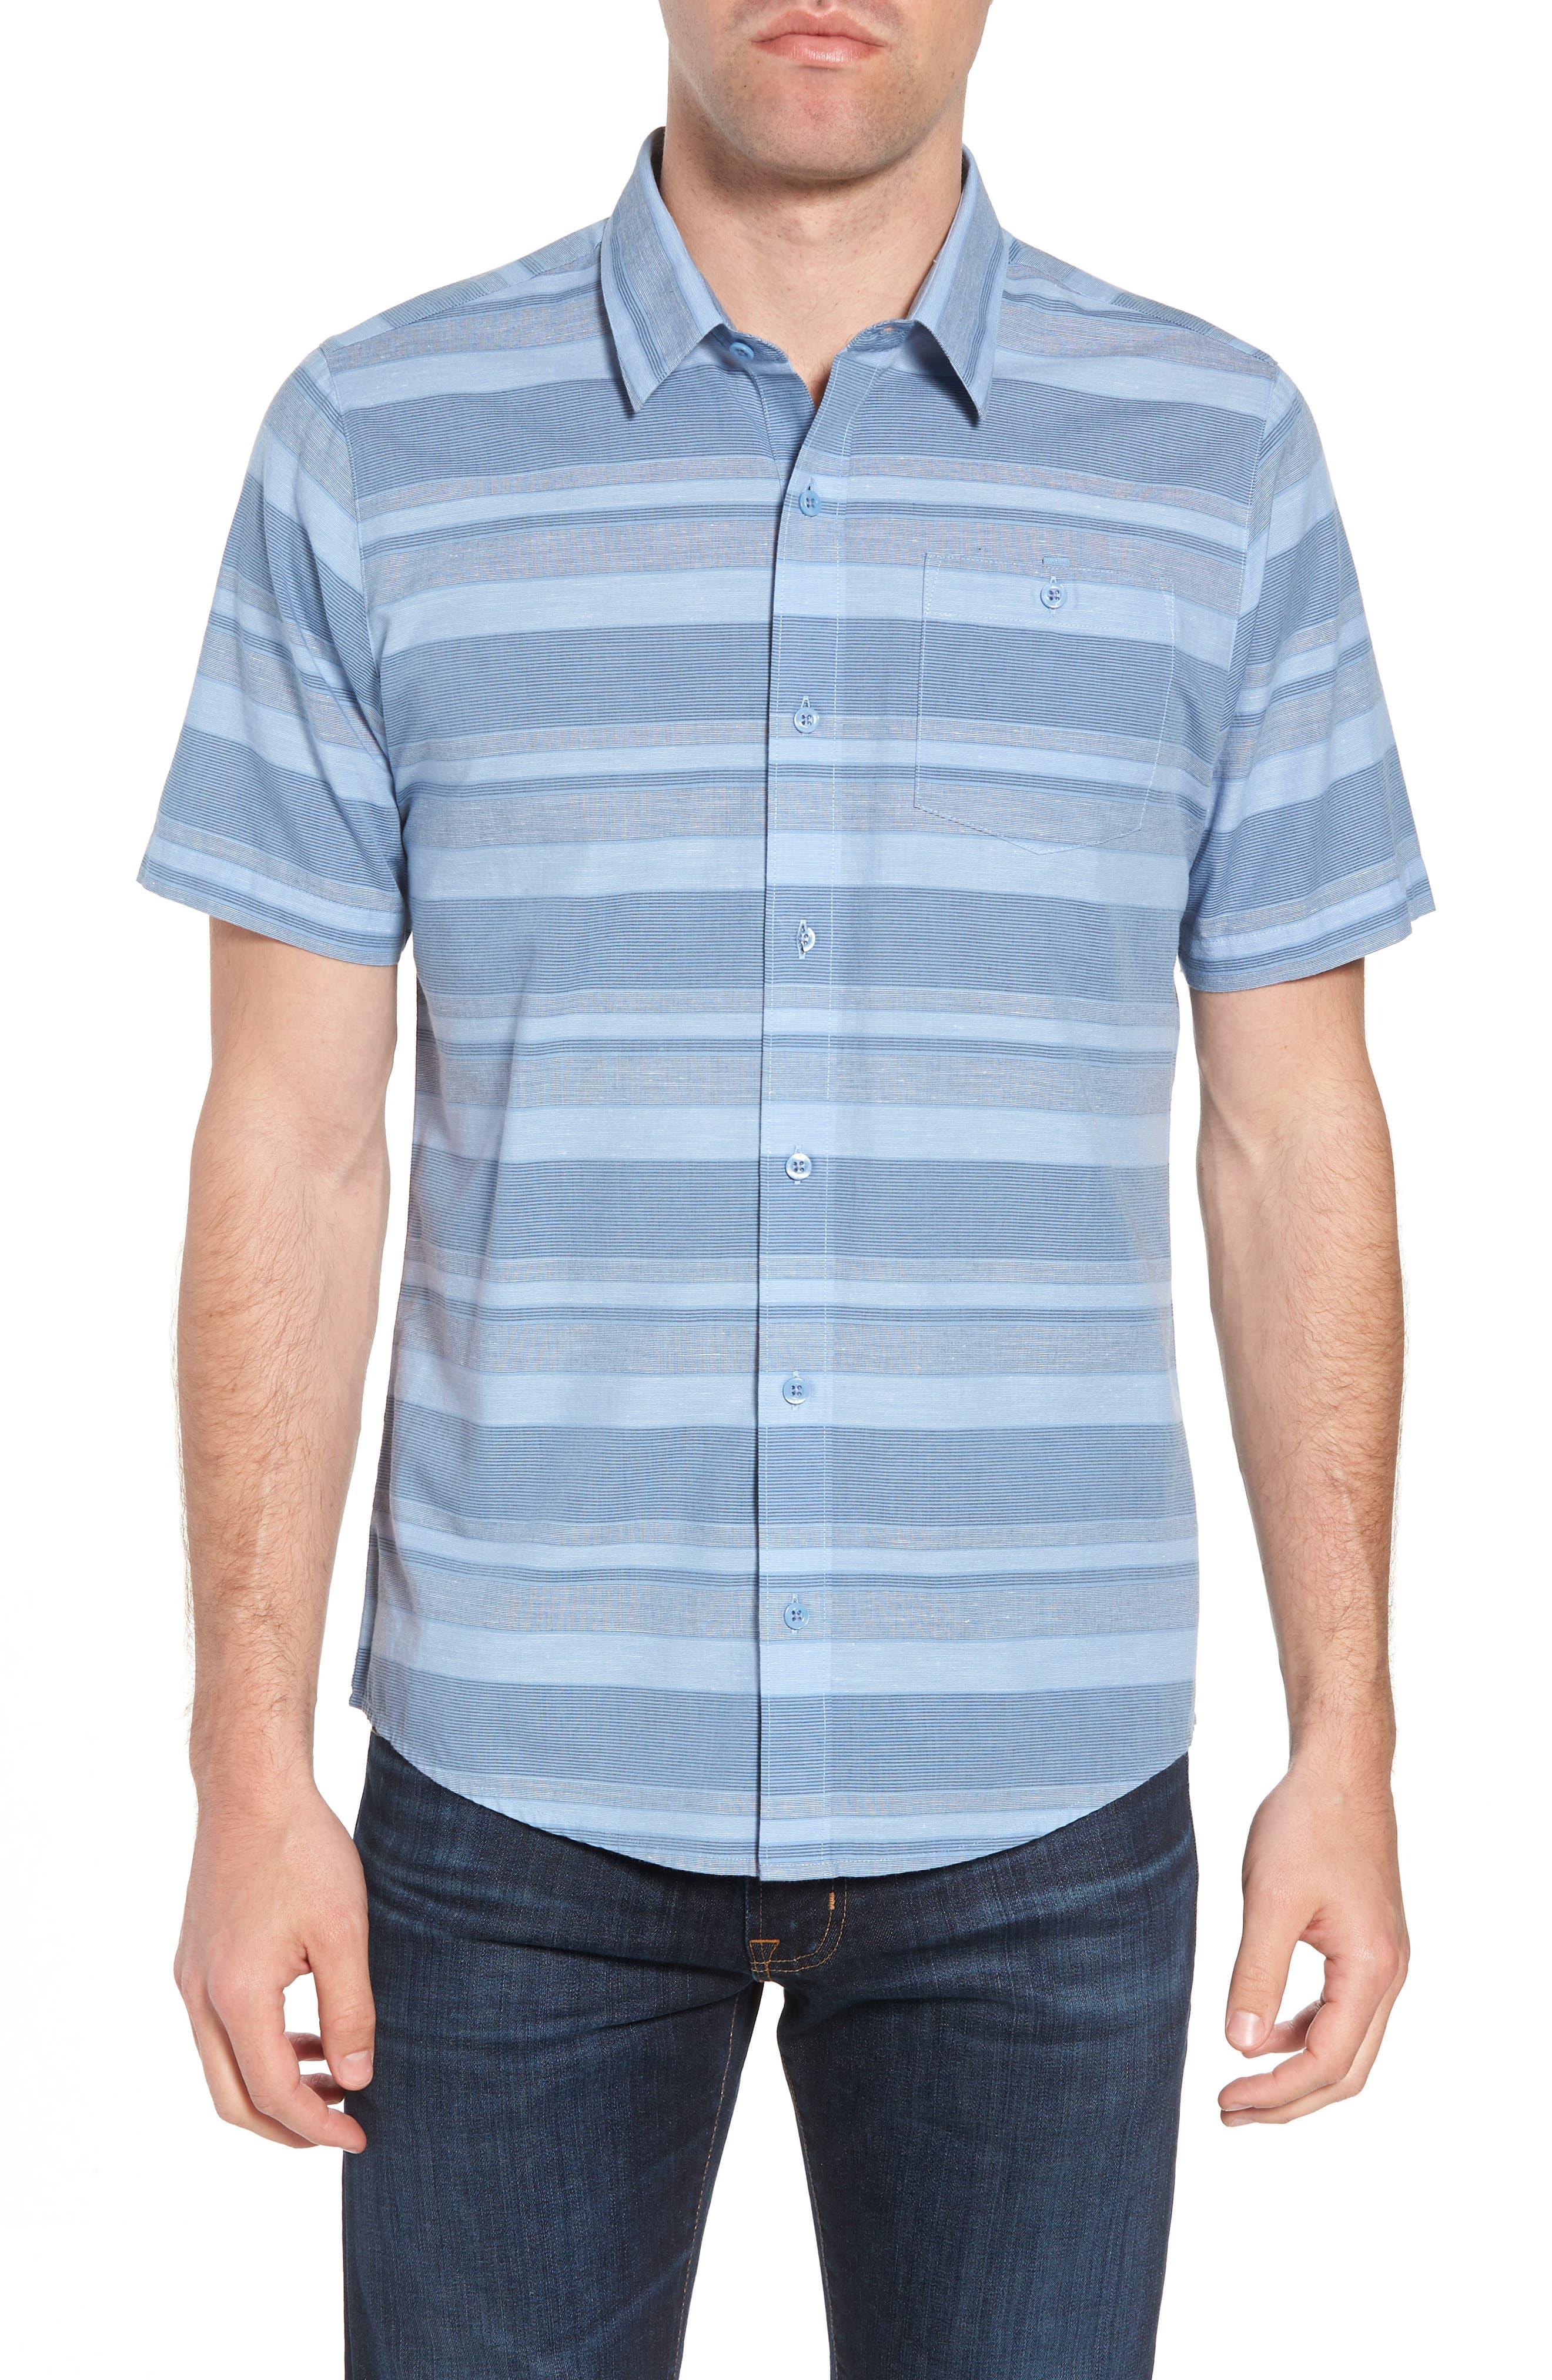 Mahe Regular Fit Sport Shirt,                             Main thumbnail 1, color,                             Heather Blue Nights